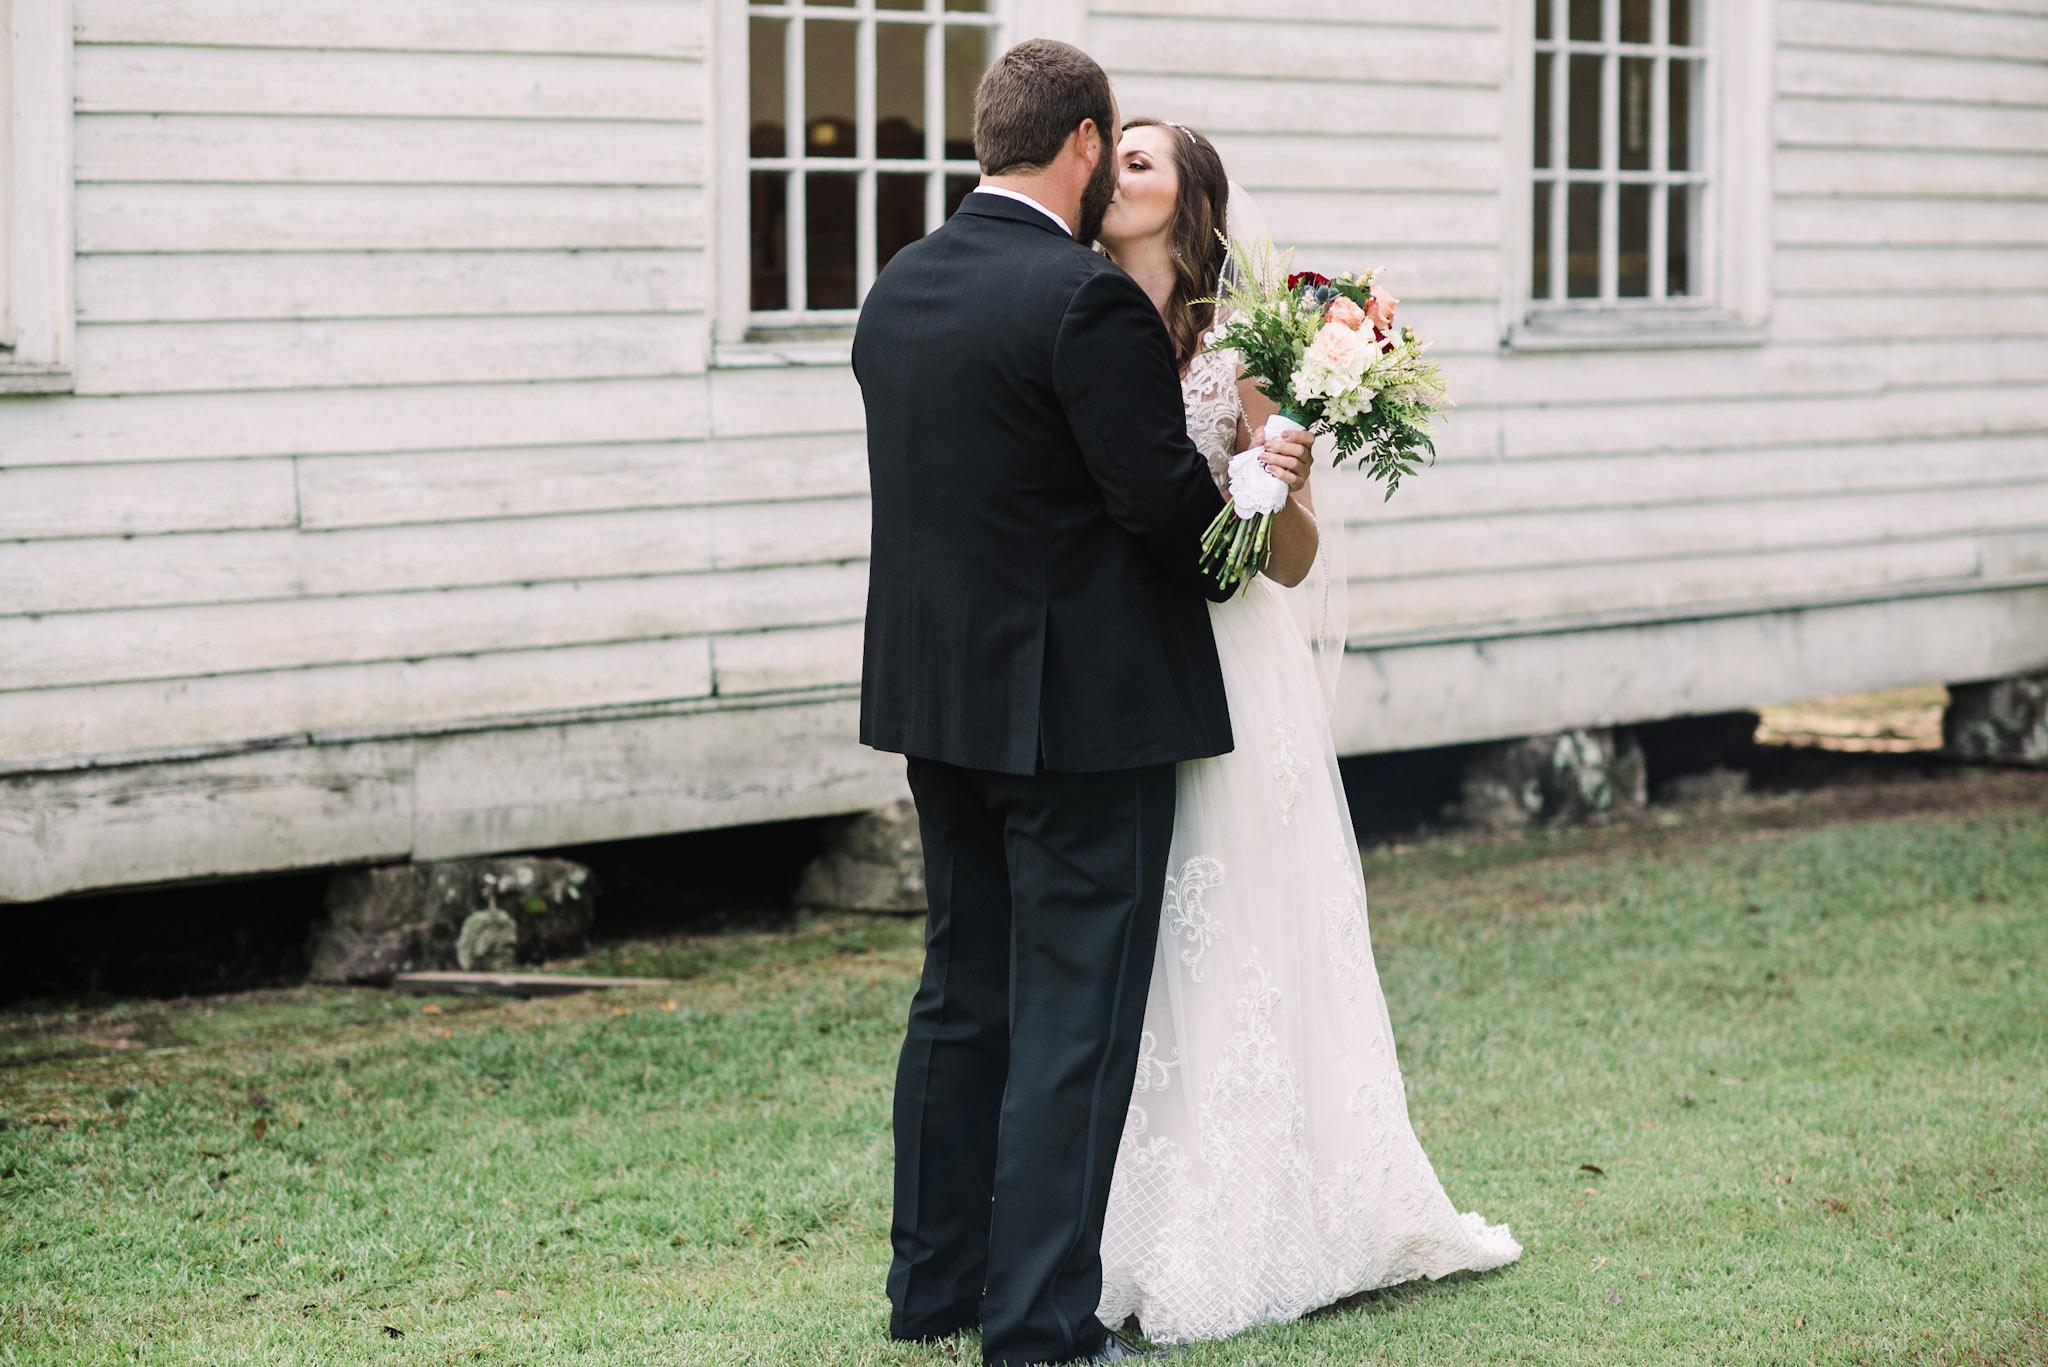 Jas_Natalie_Foxworth_Wedding_2018-8.jpg